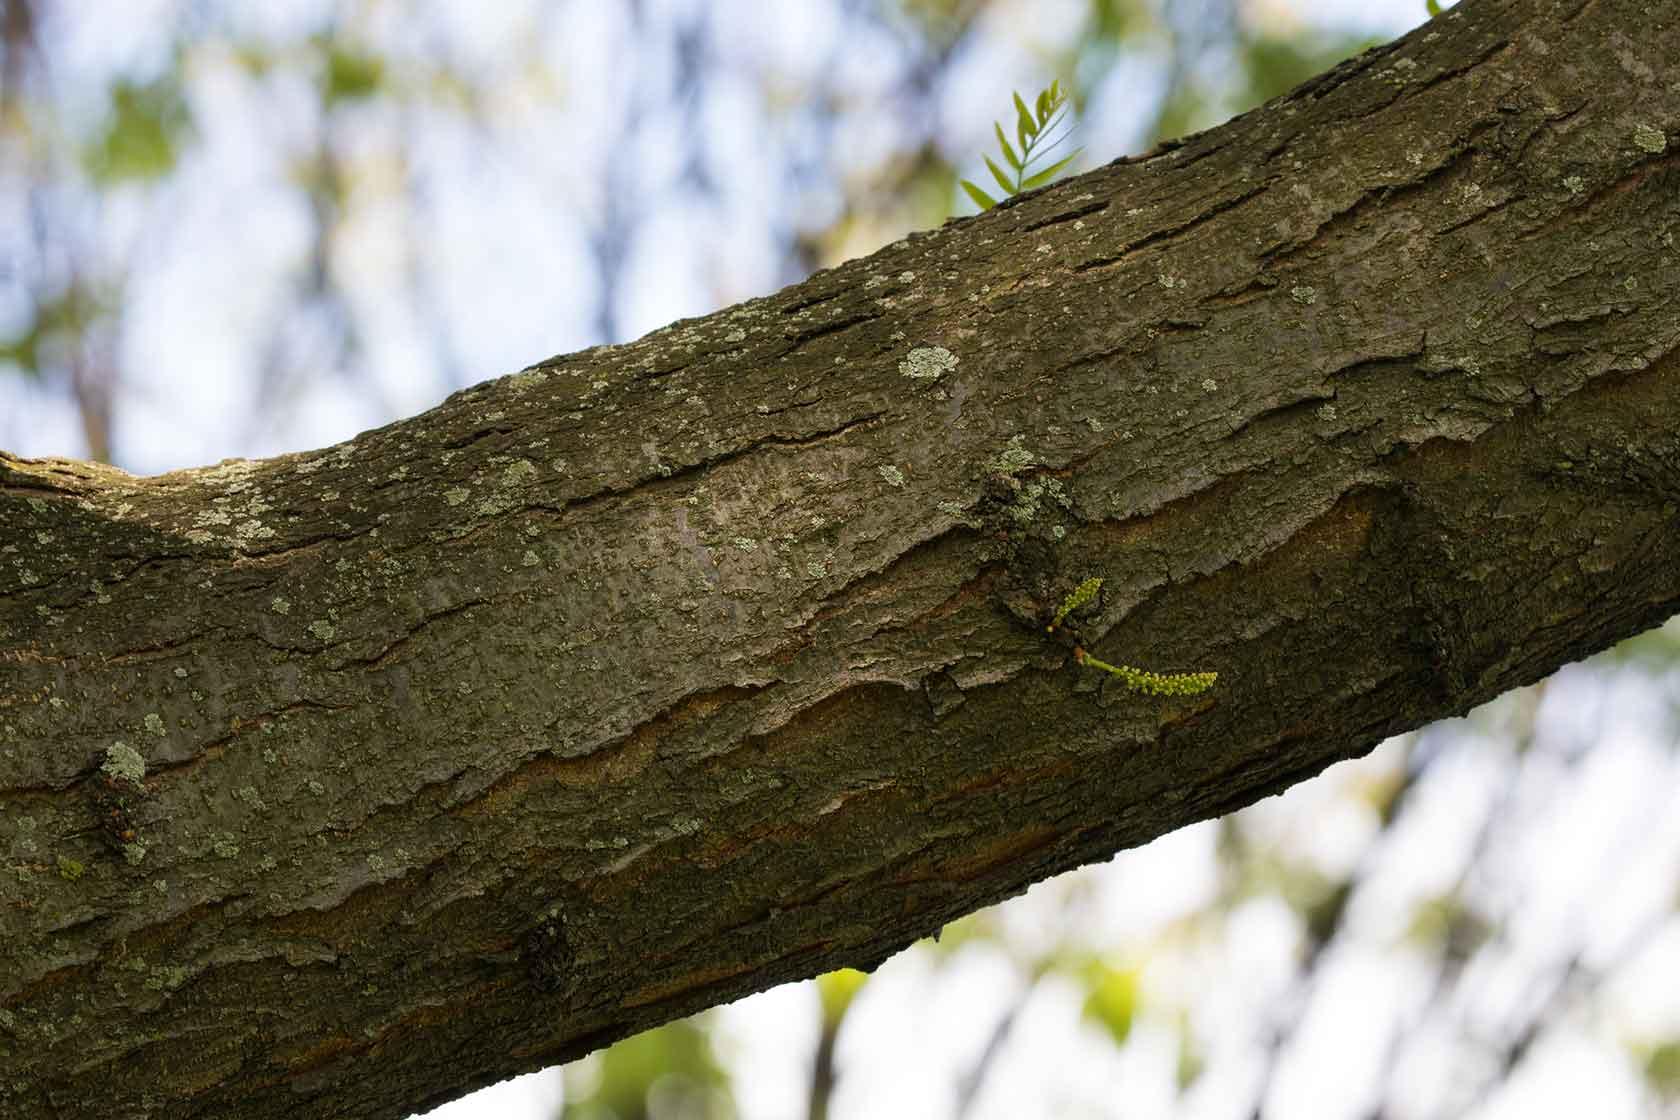 A branch on the honey locust tree